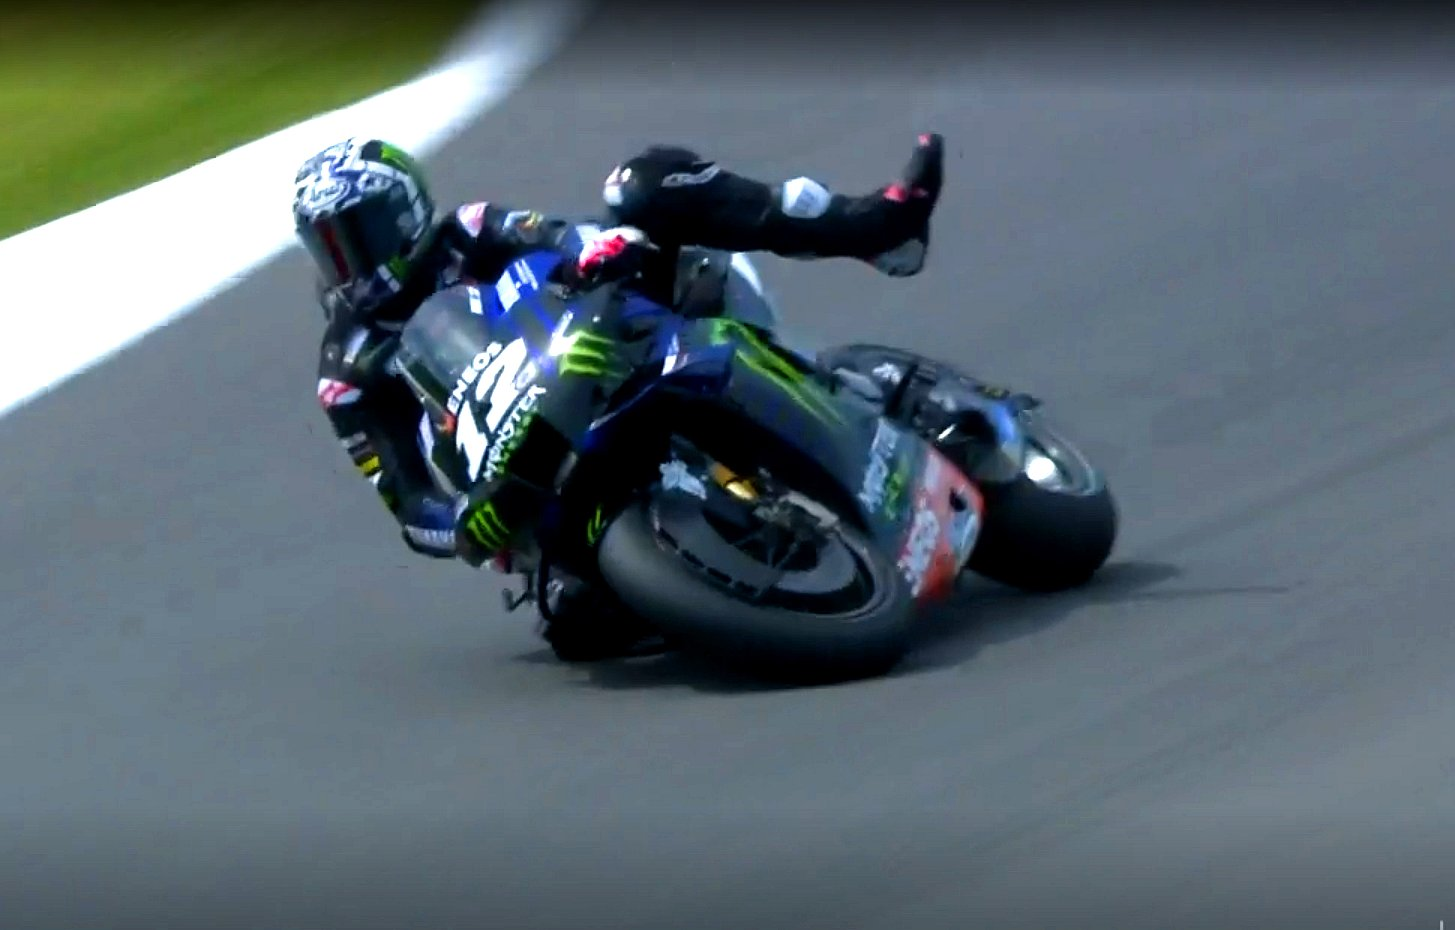 Moto GP 2021 - Page 16 E2iyc0sXEAAReWX?format=jpg&name=large